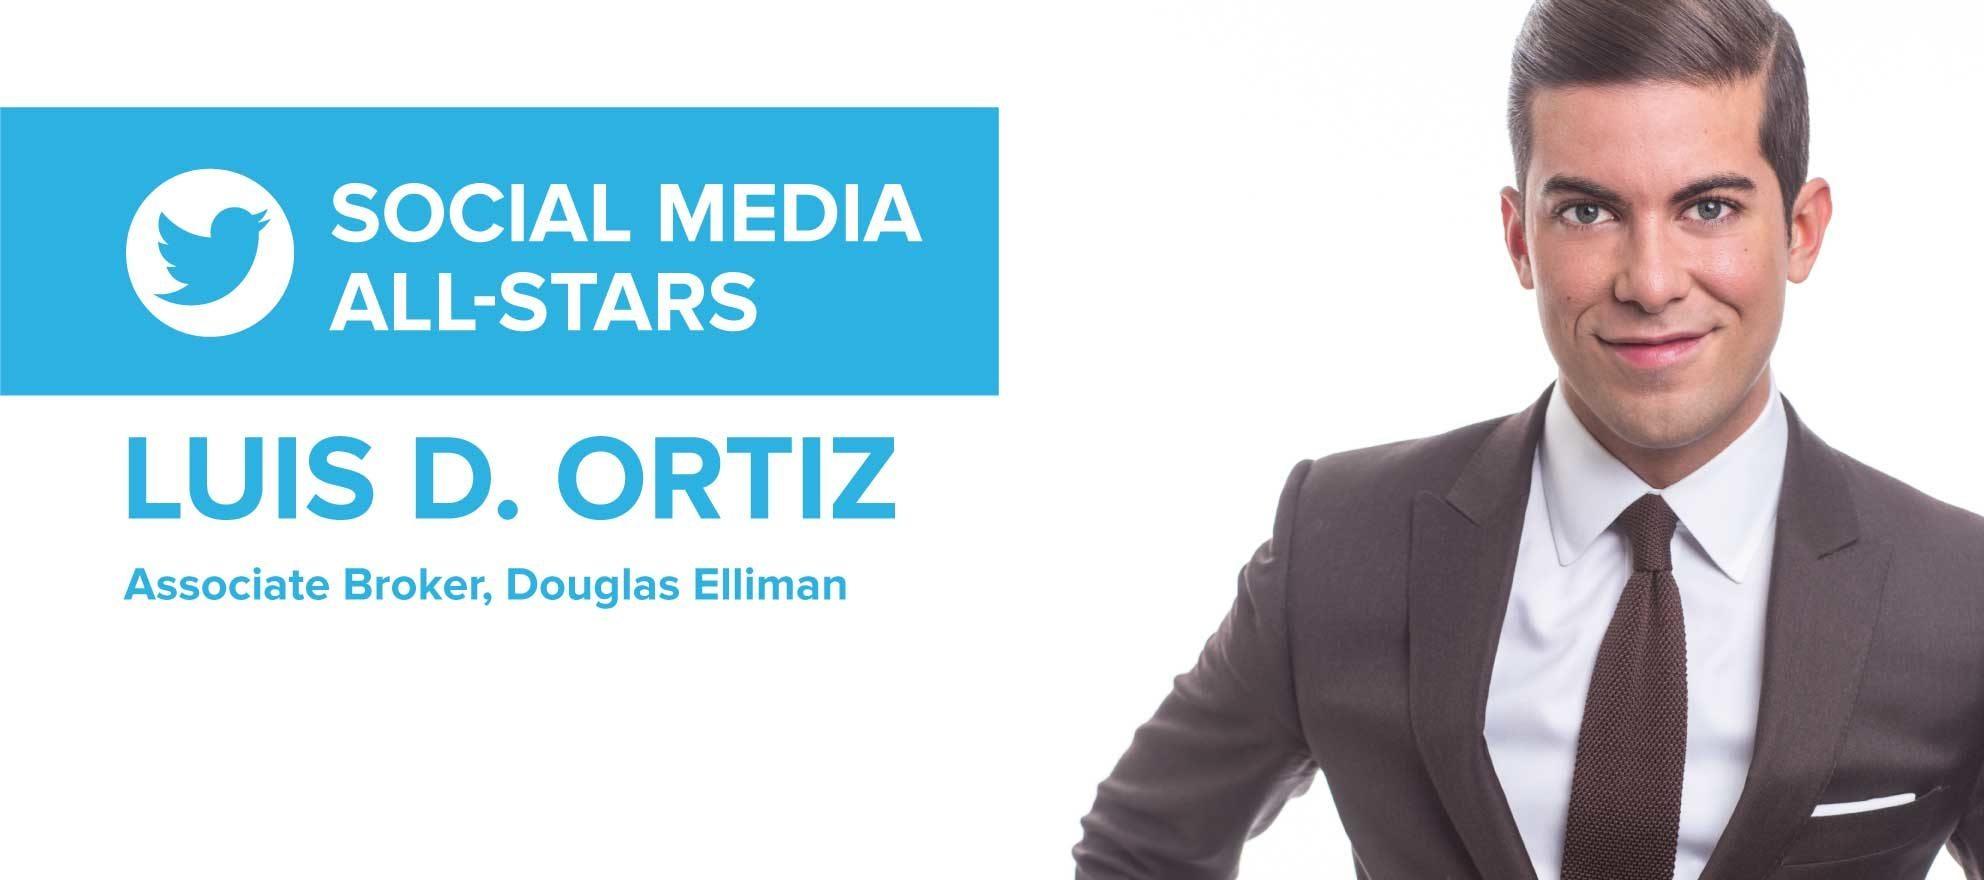 Luis D. Ortiz: 'I really love how immediate Twitter is'